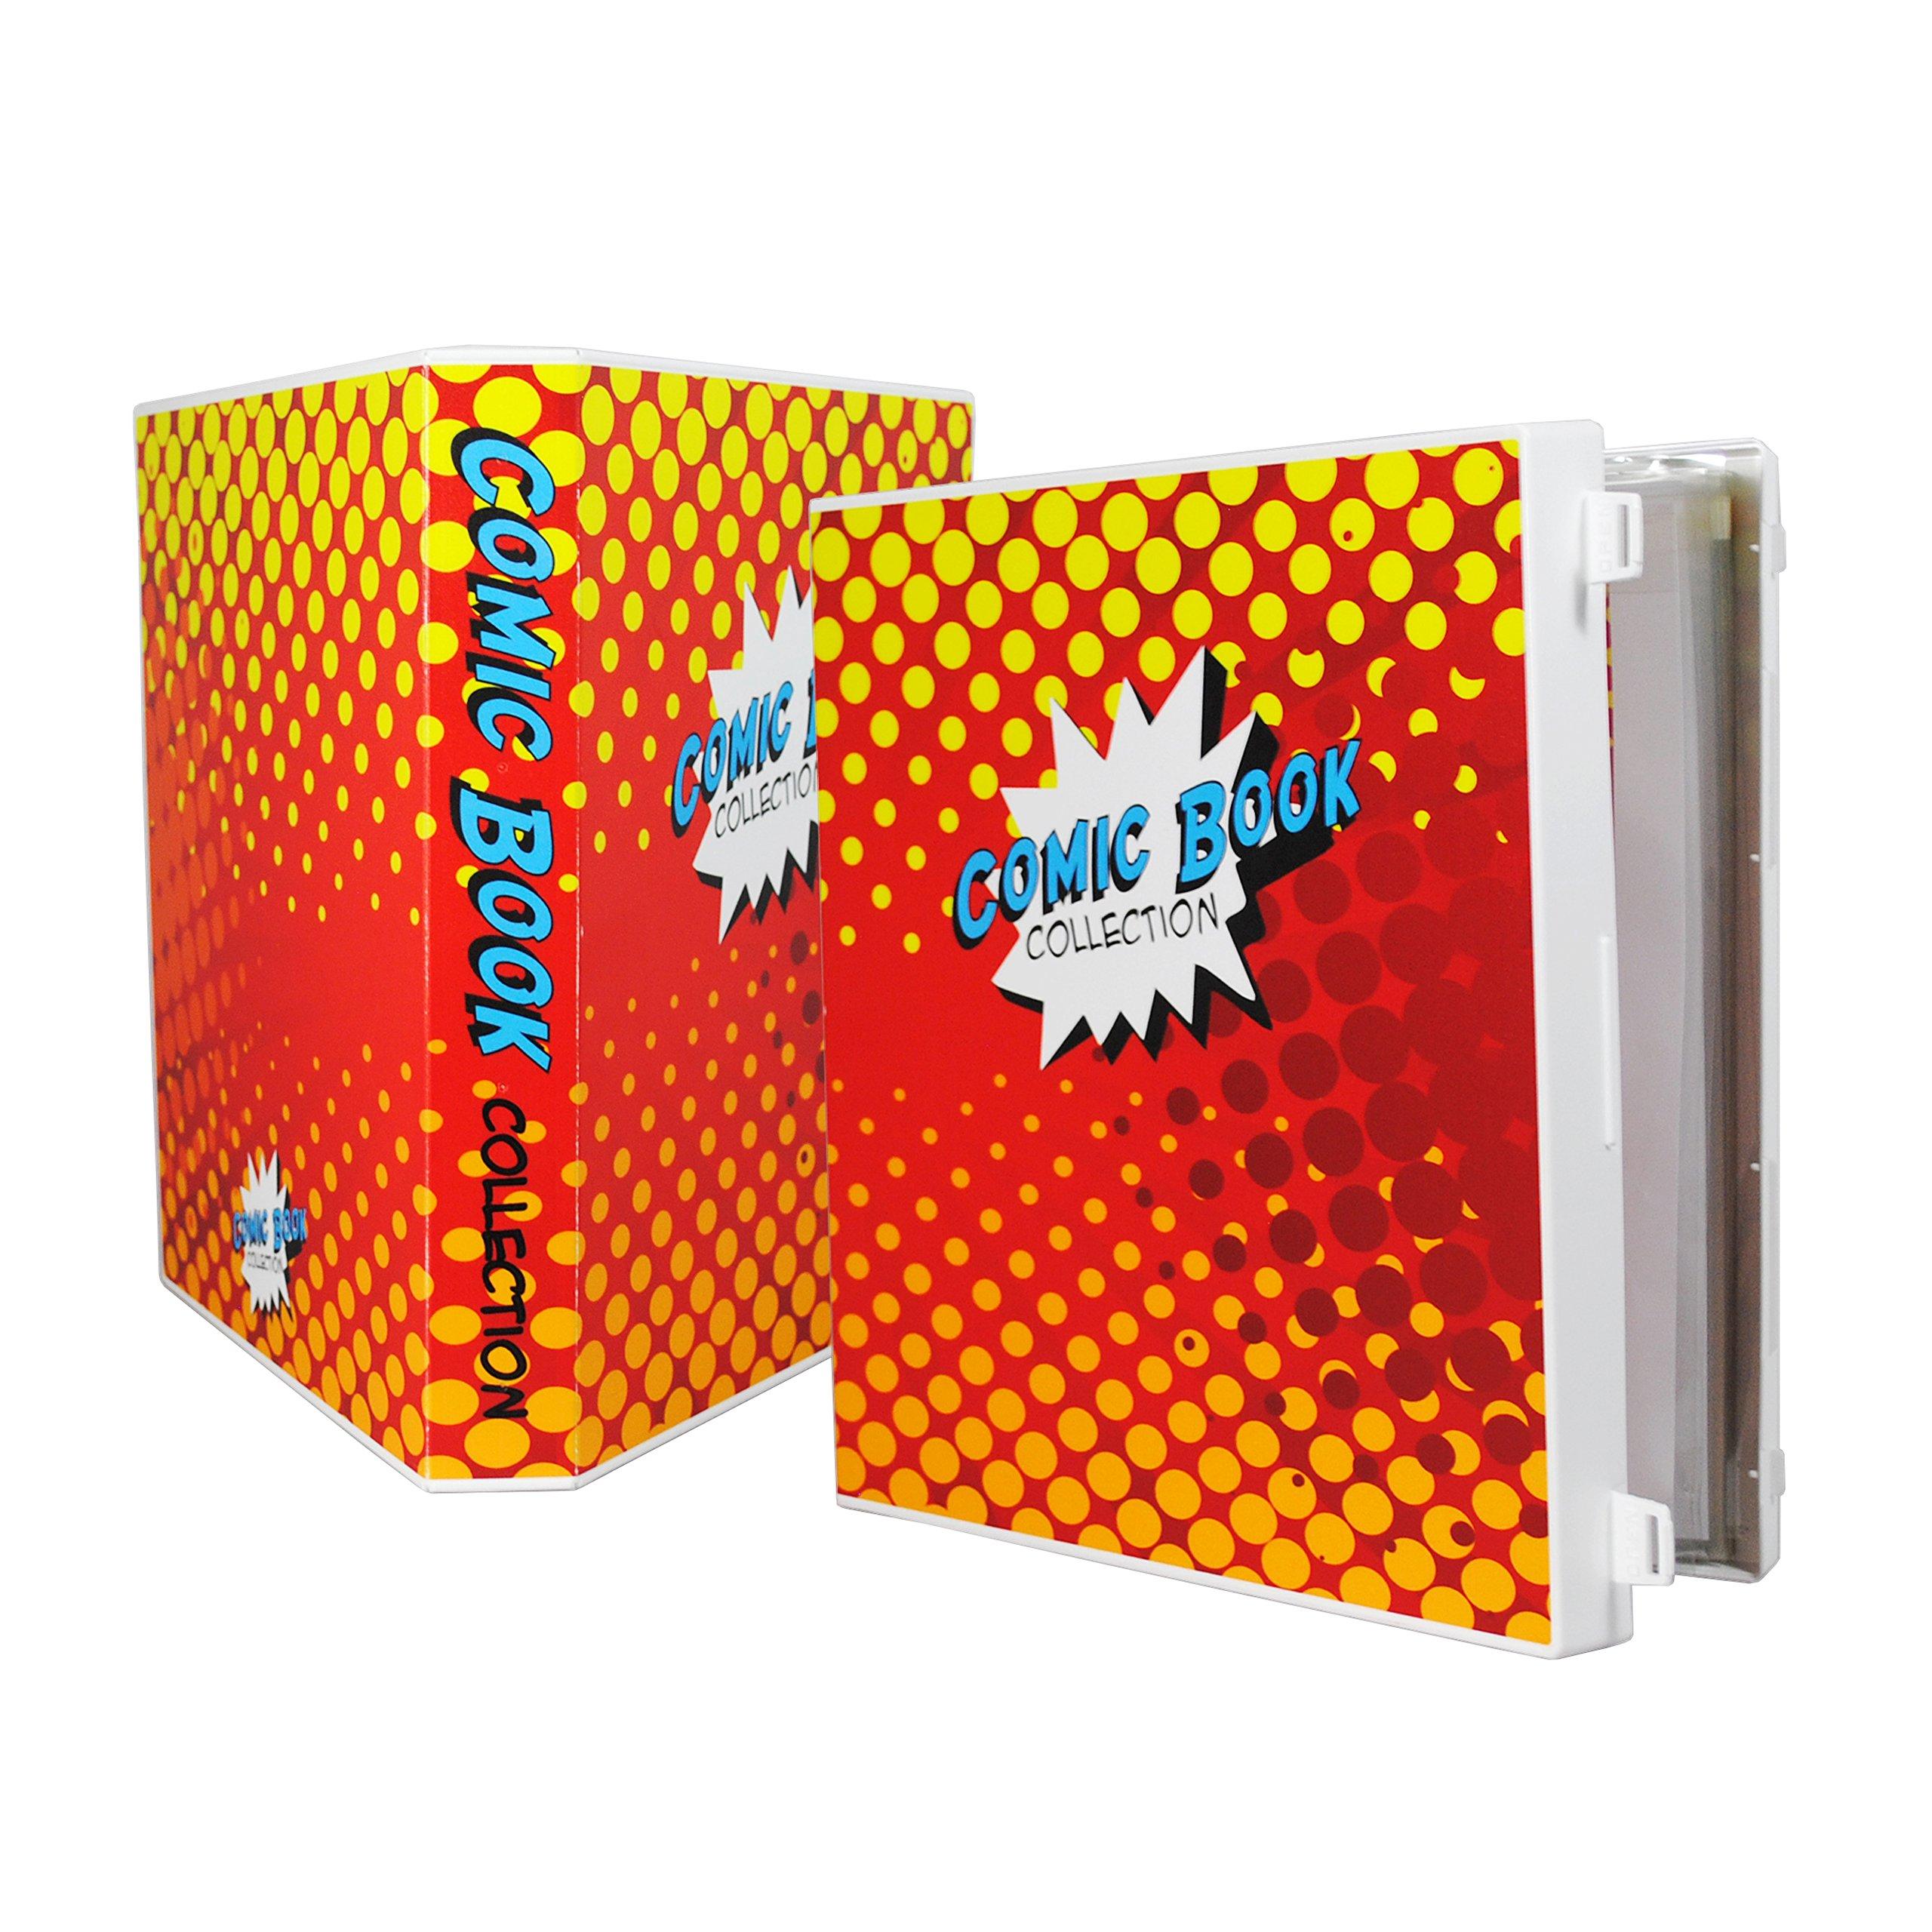 UniKeep Comic Book Collection Storage Album and Binder